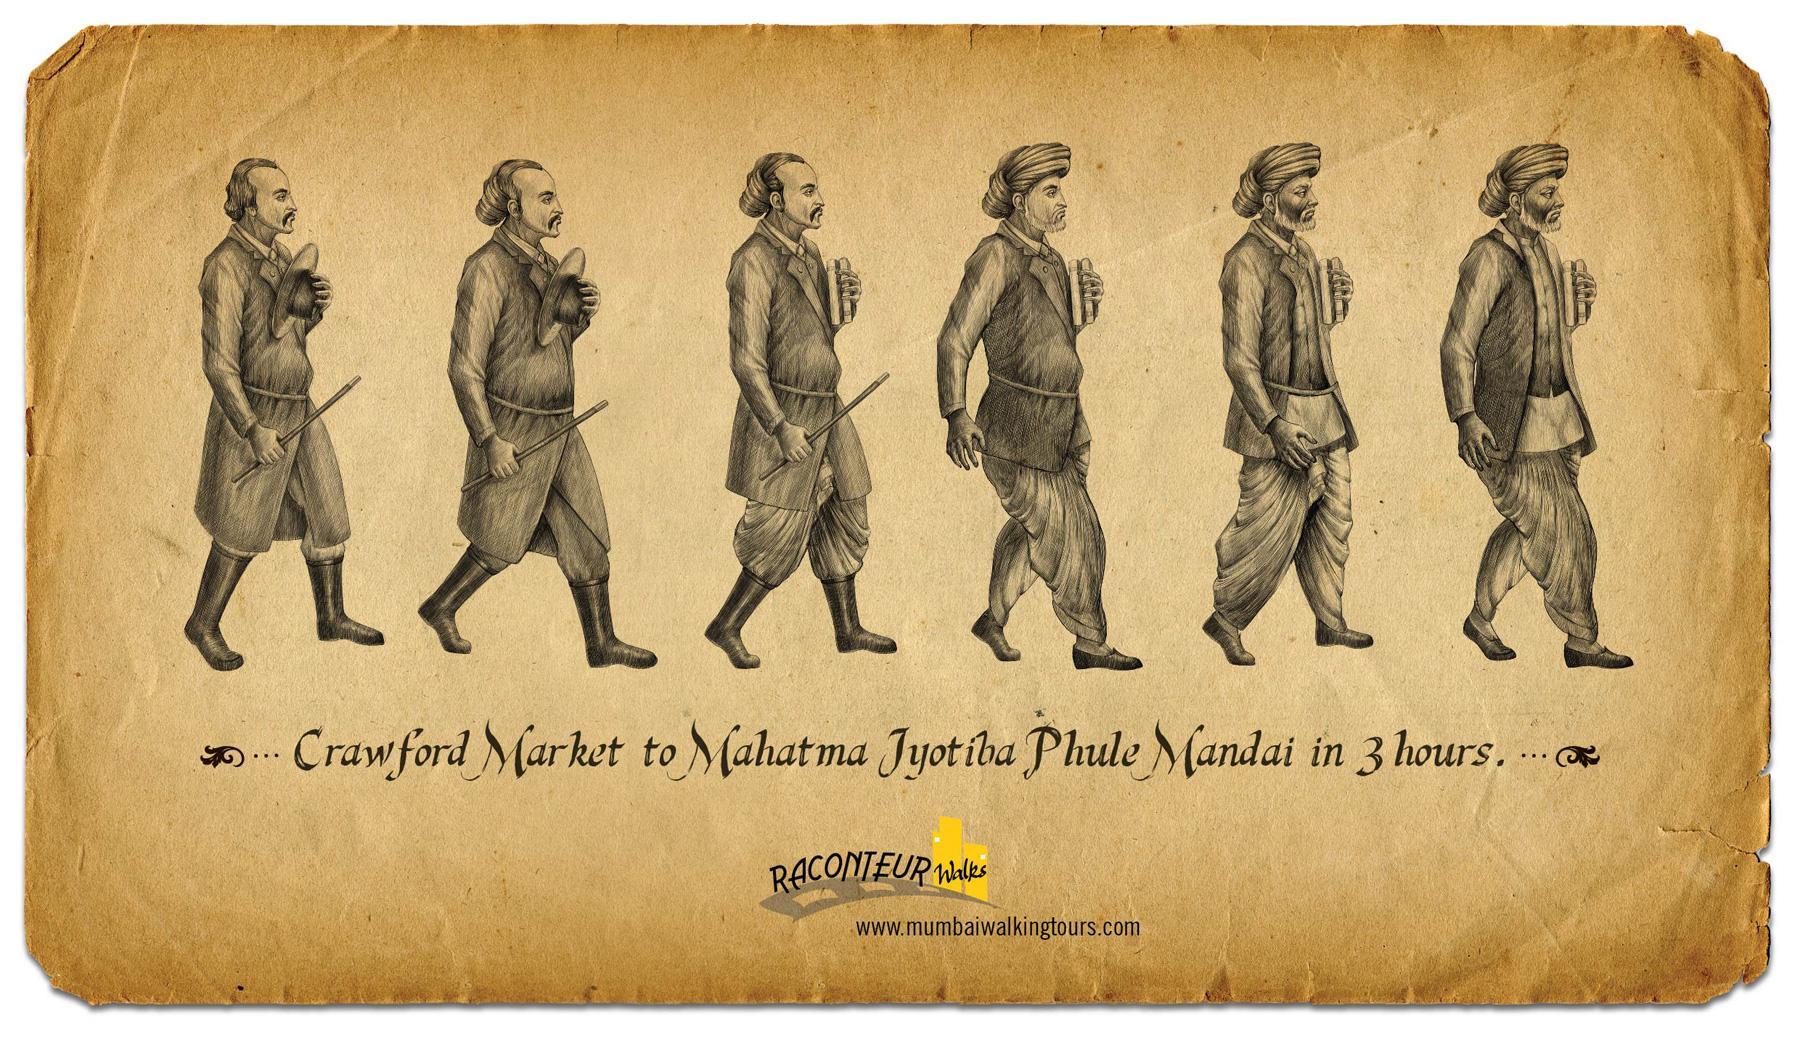 Raconteur Walks Print Ad -  Crawford Market to Mahatma Jyotiba Phule Mandai